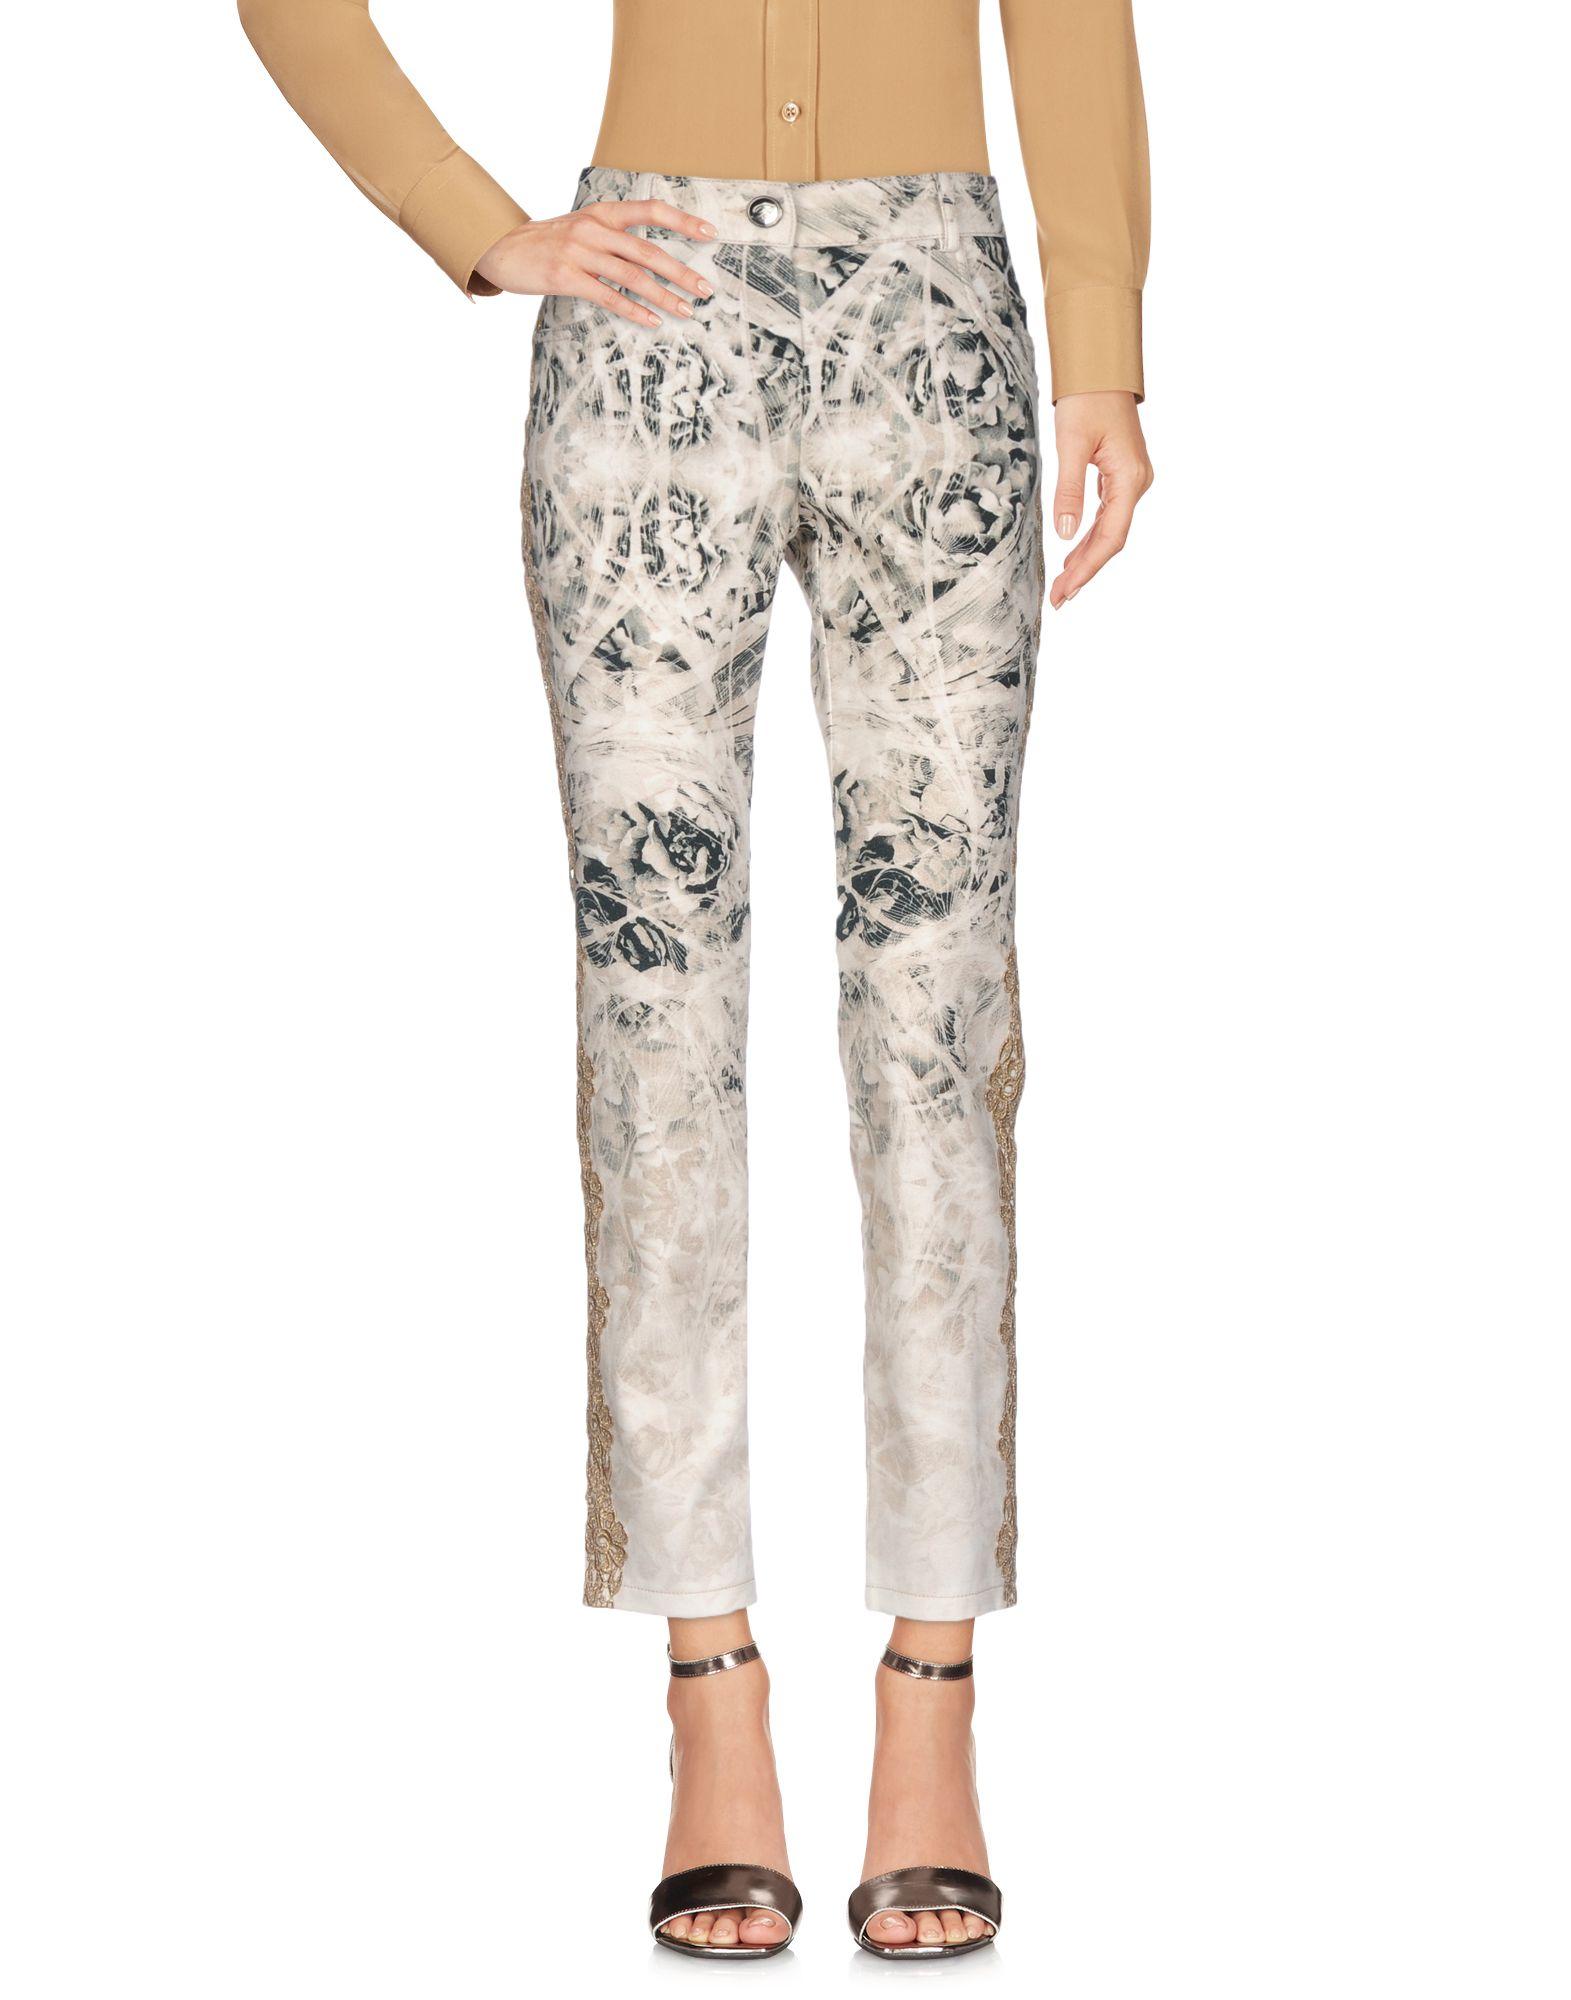 Pantalone Blumarine Donna - Acquista online su DYcdFs